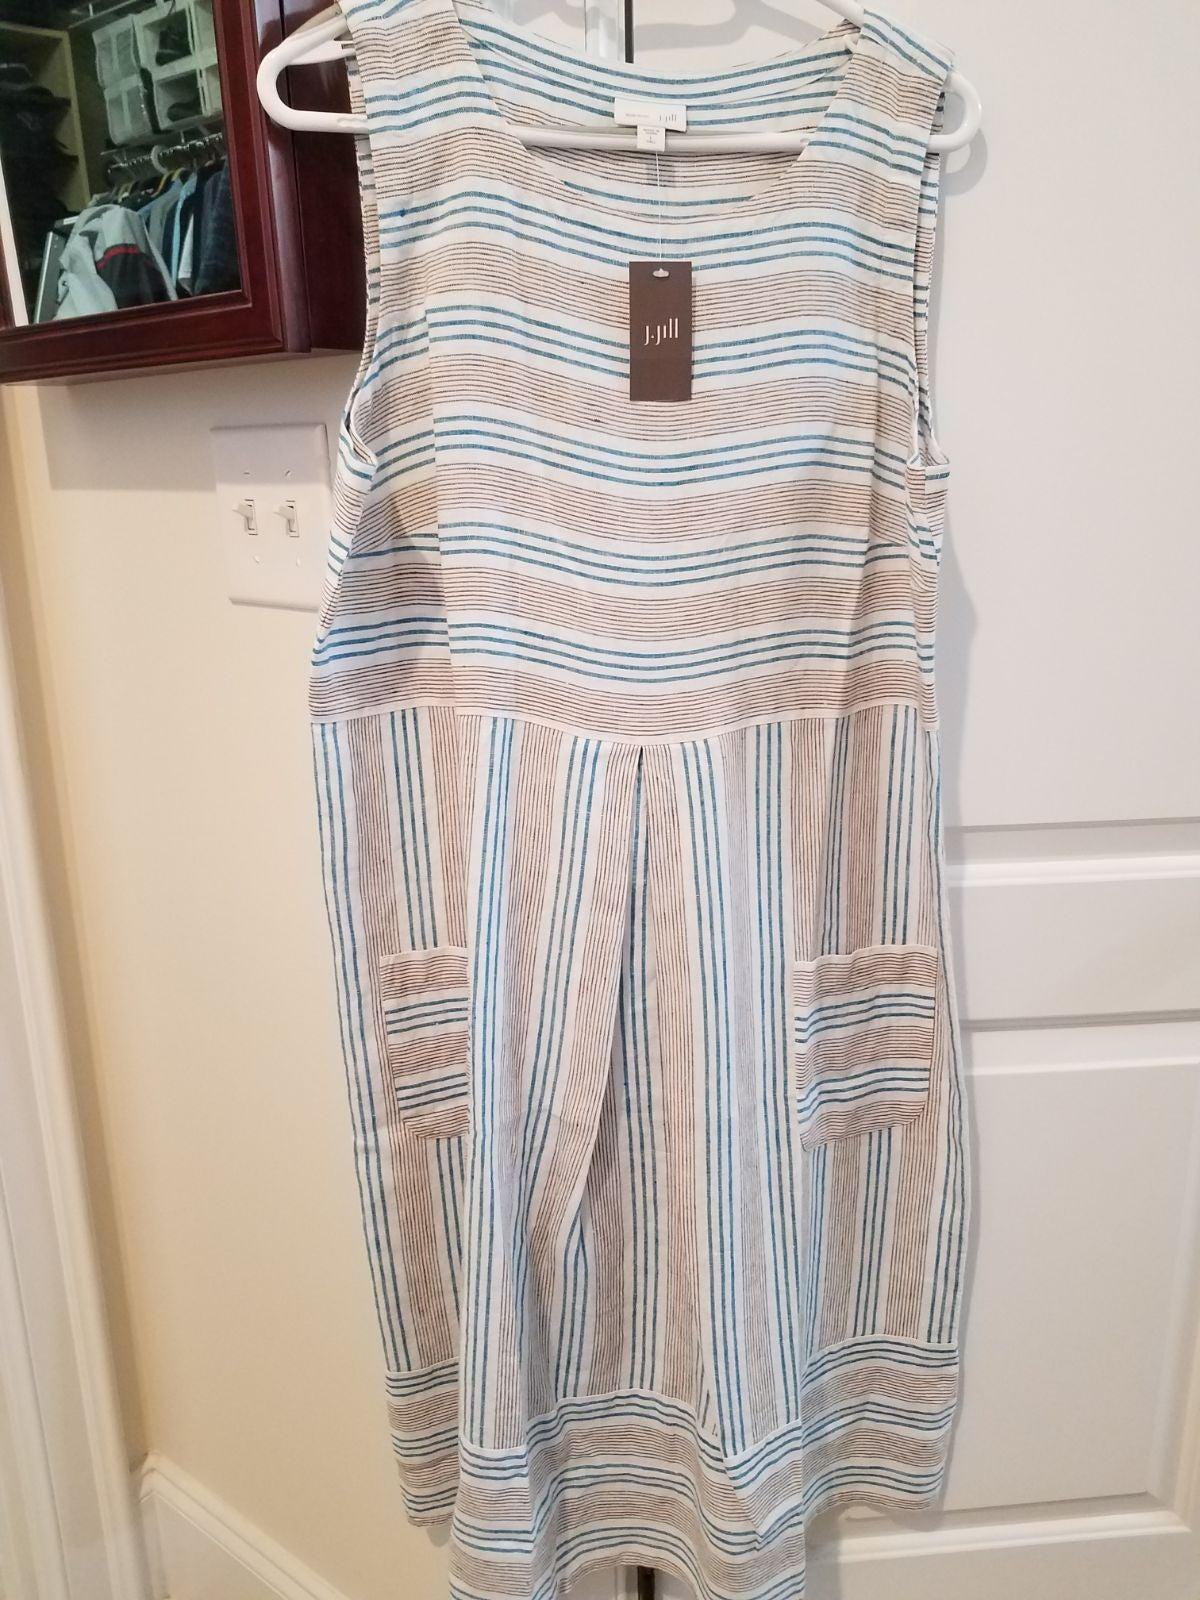 NWT j jill linen dress large